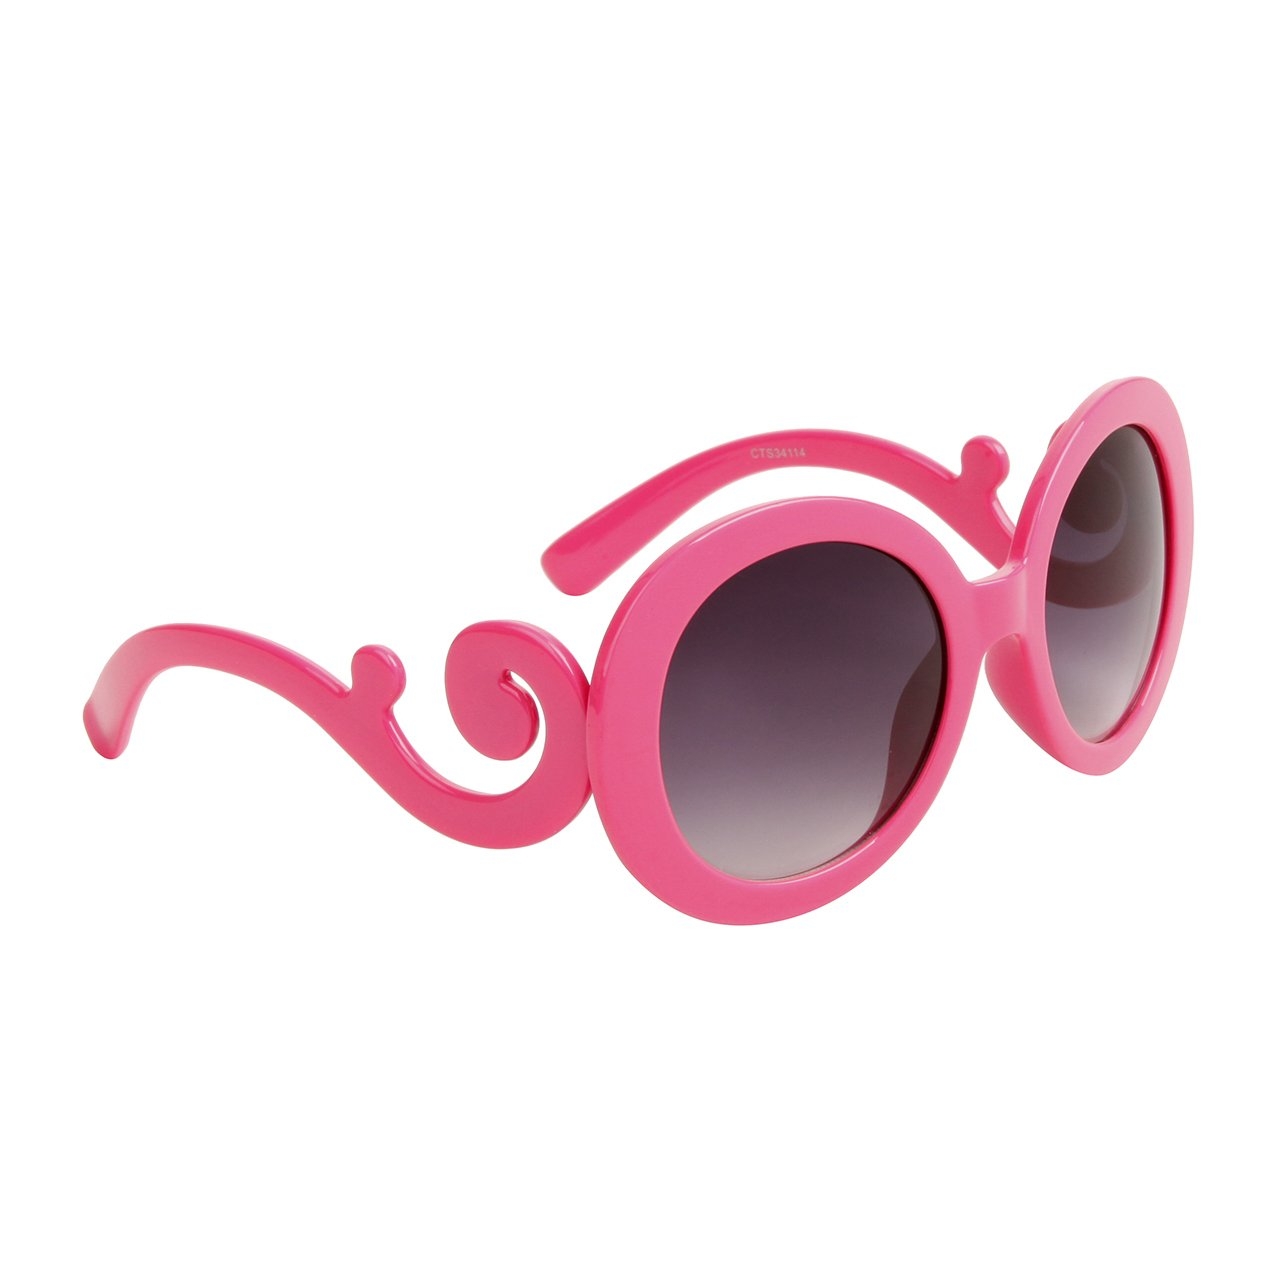 DESIGNER INSPIRED WOMEN'S SUNGLASSES PINK FRAME TOP QUALITY UV PROTECTION